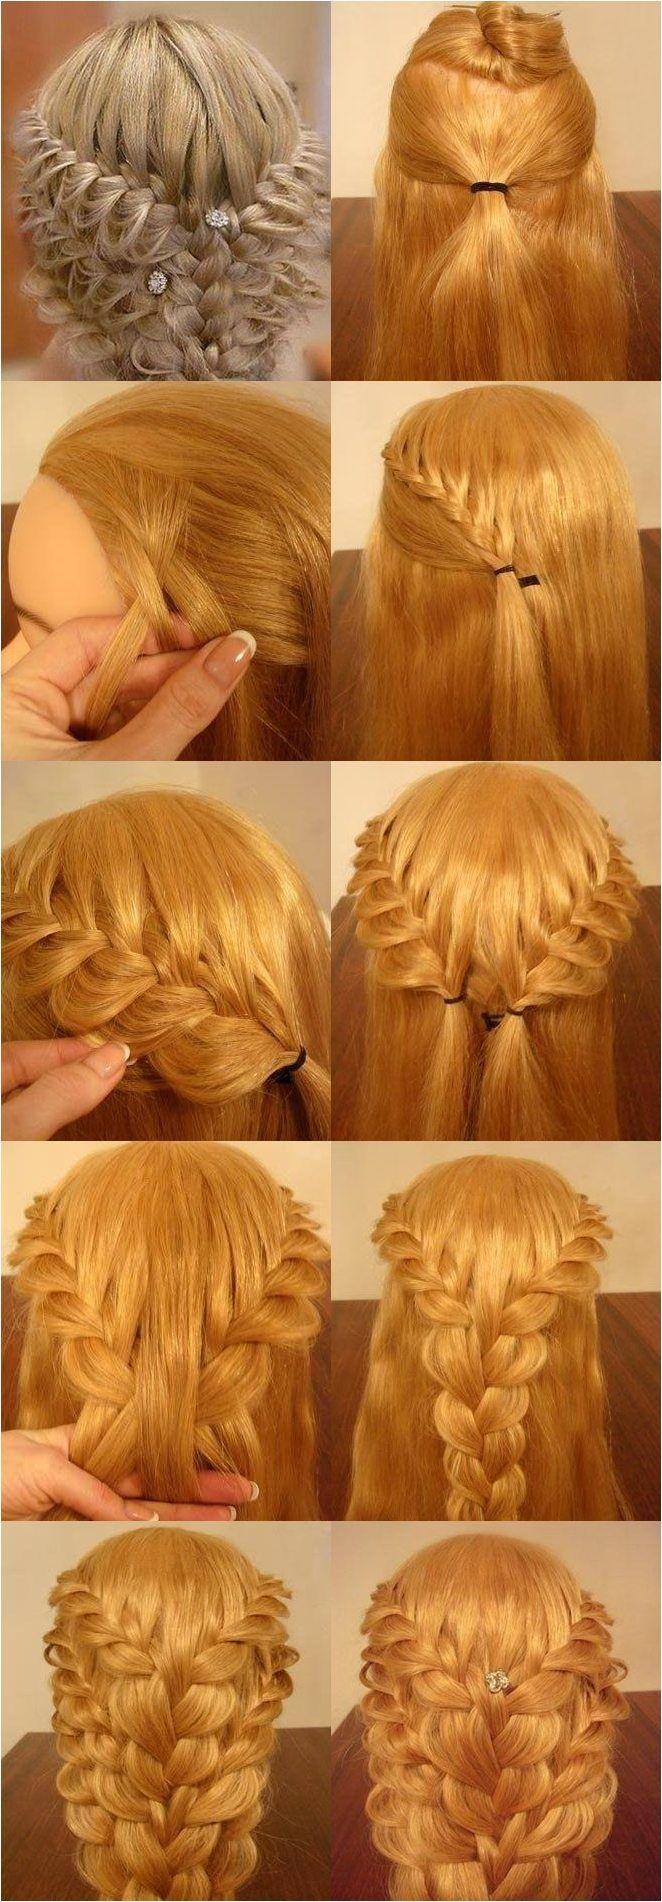 91 Best Images About Hair On Pinterest Renaissance Hair Anne